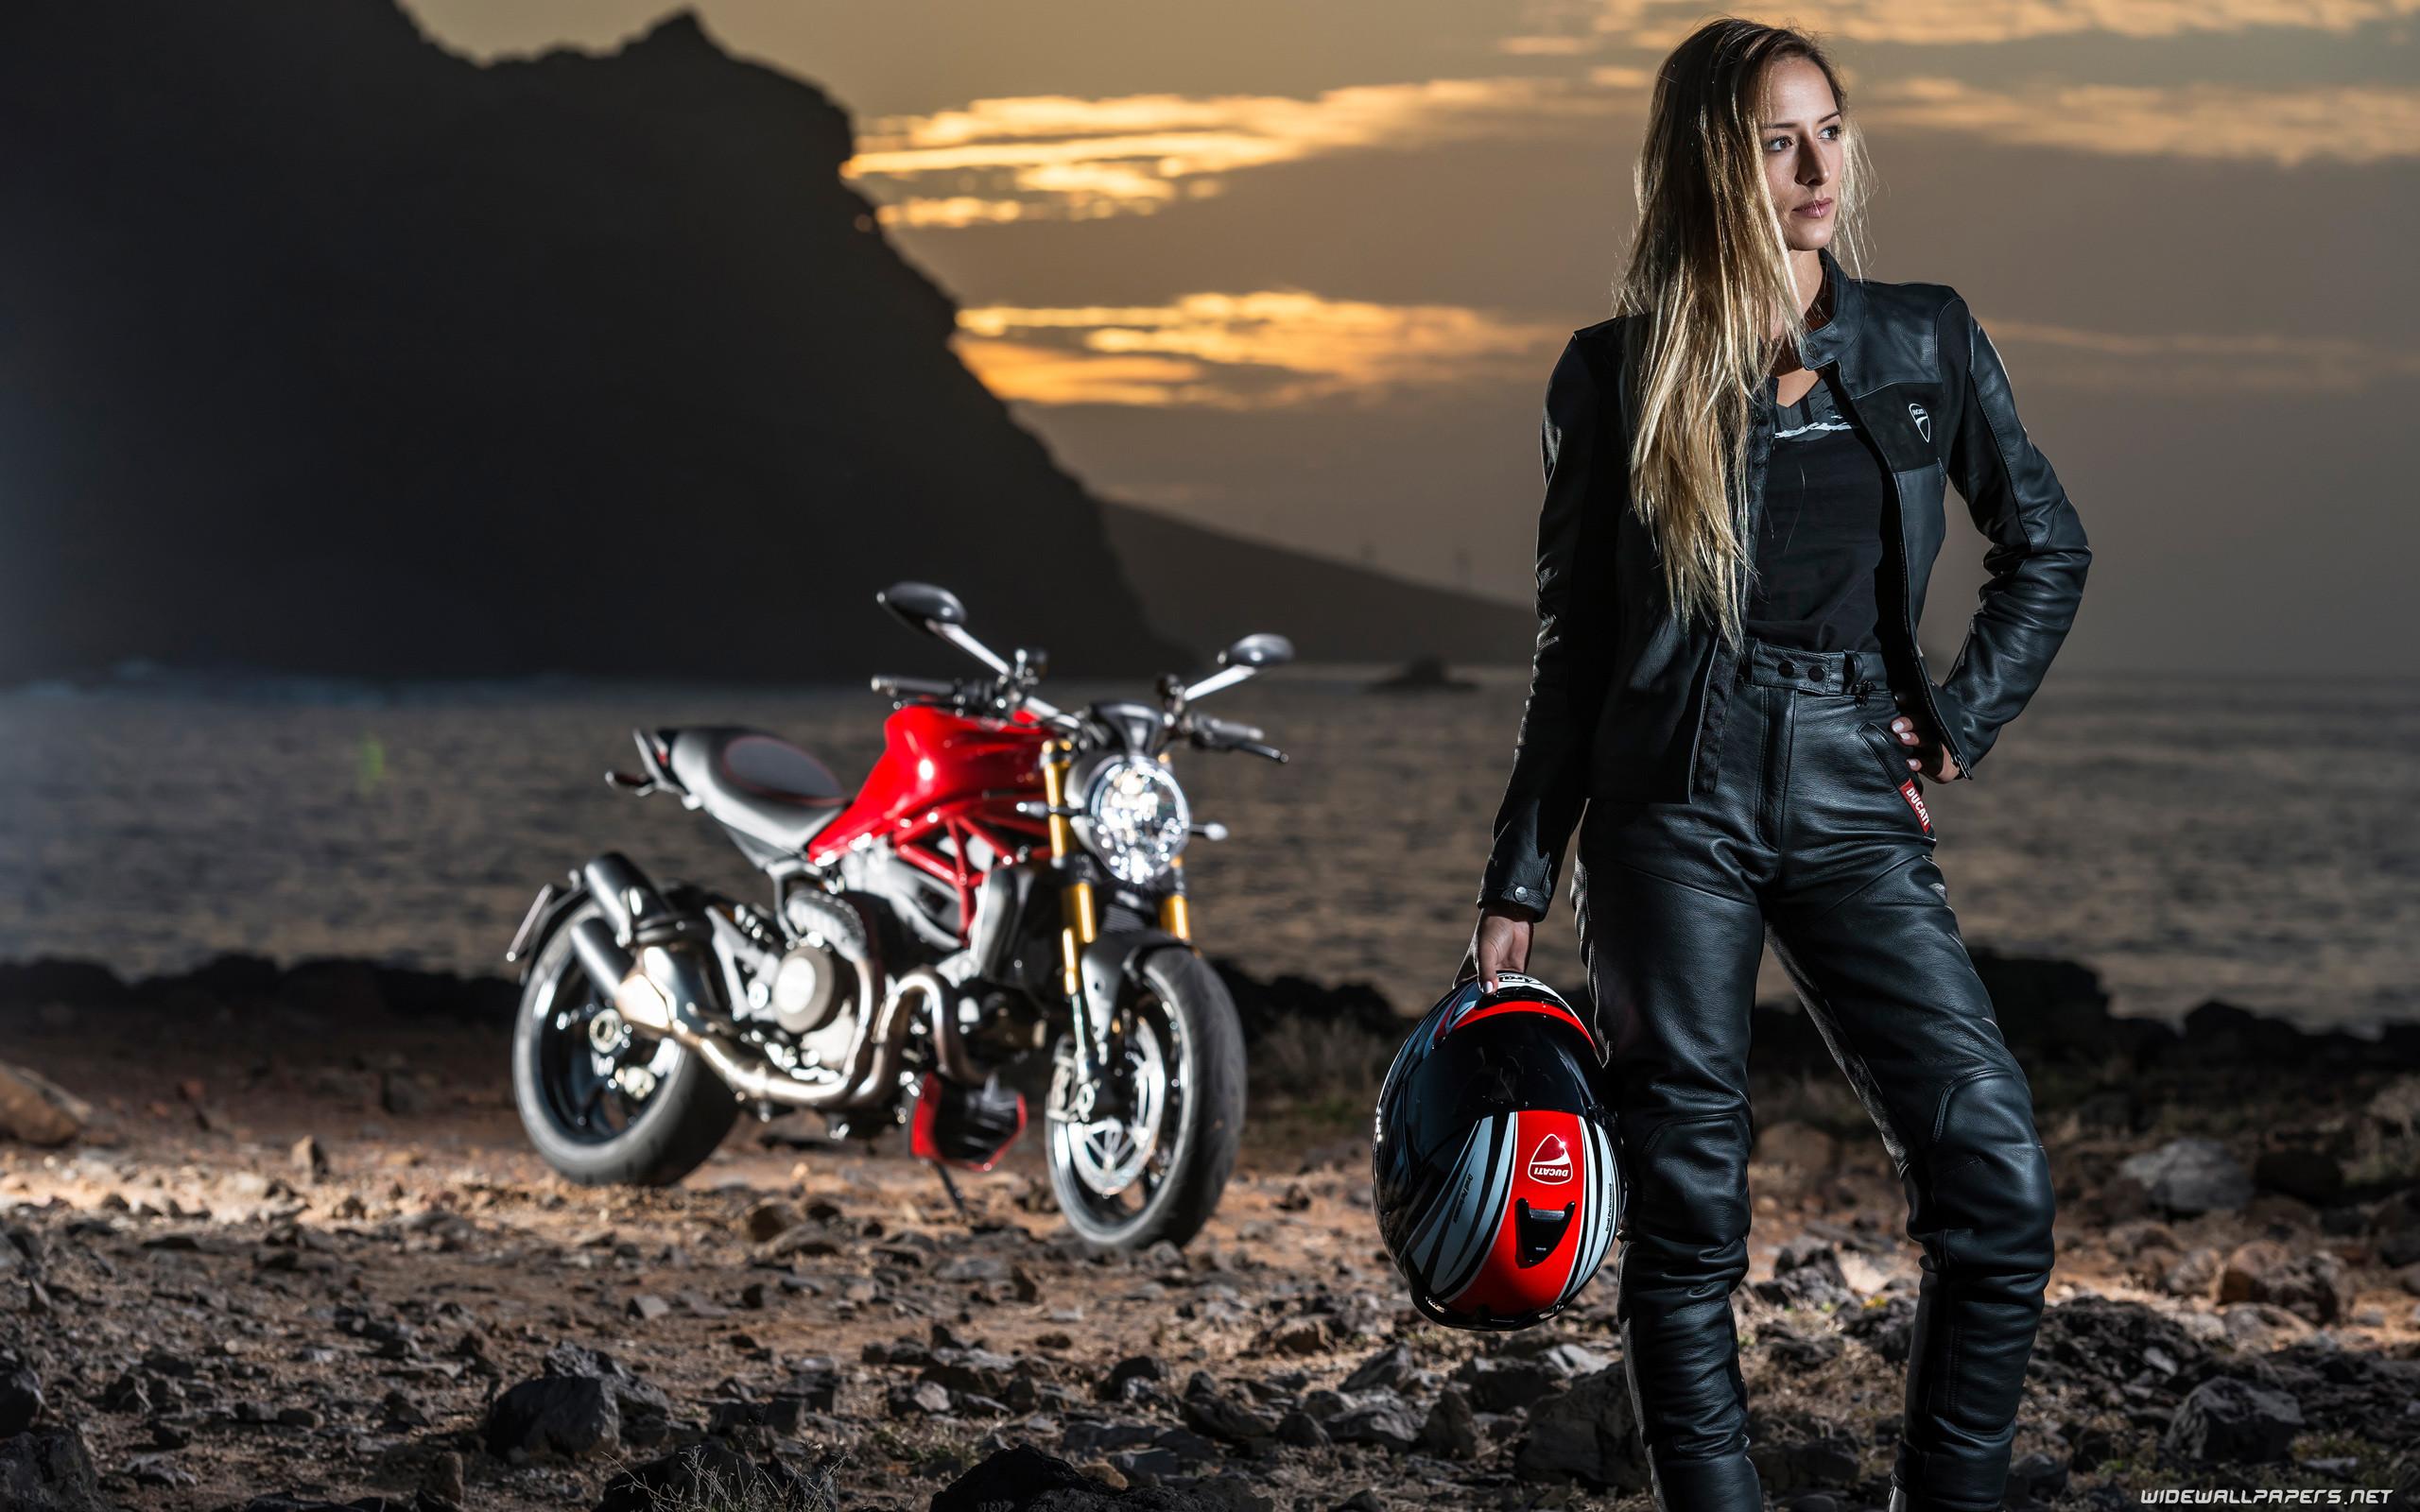 Bike and Girl 2560×1440 3840×2160